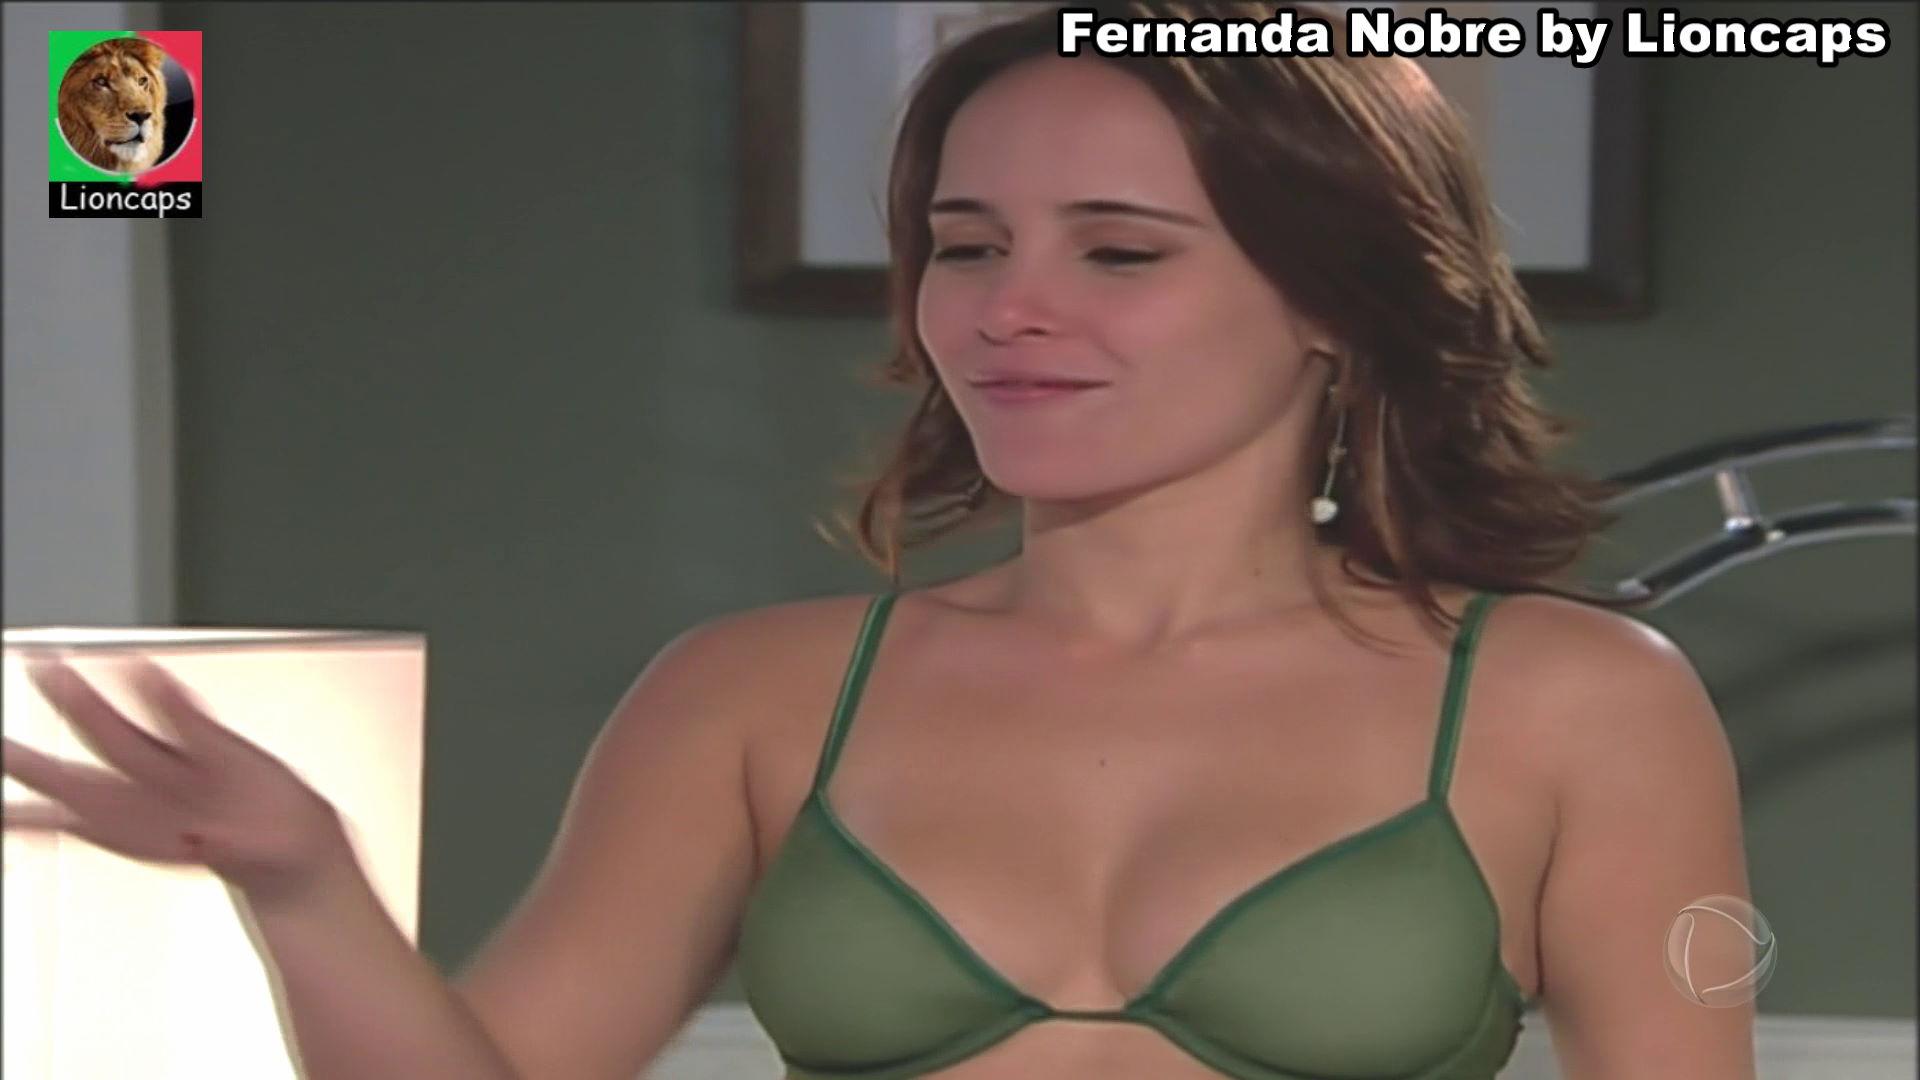 249442137_fernanda_nobre_vs200105_0412_122_386lo.JPG